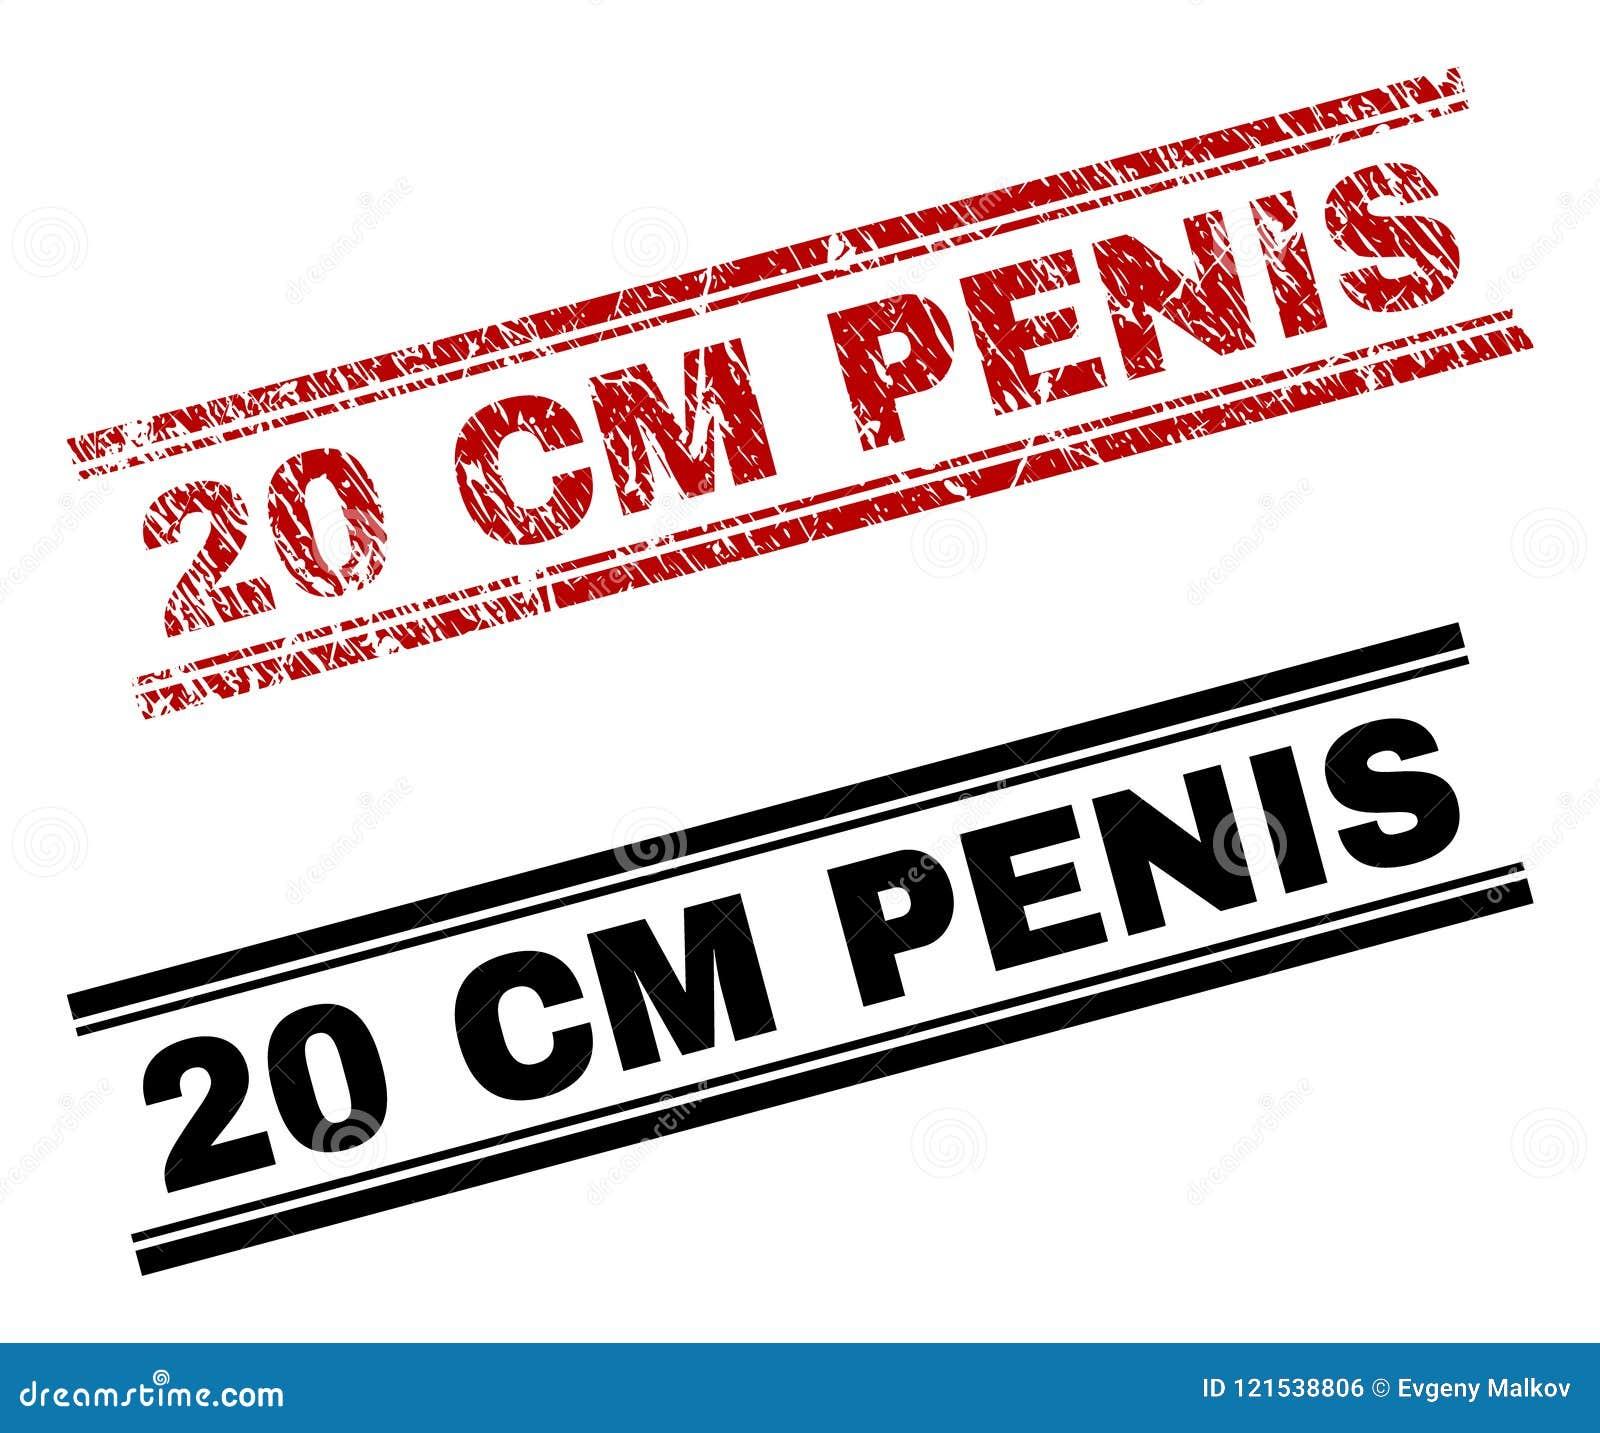 pene de 20 cm